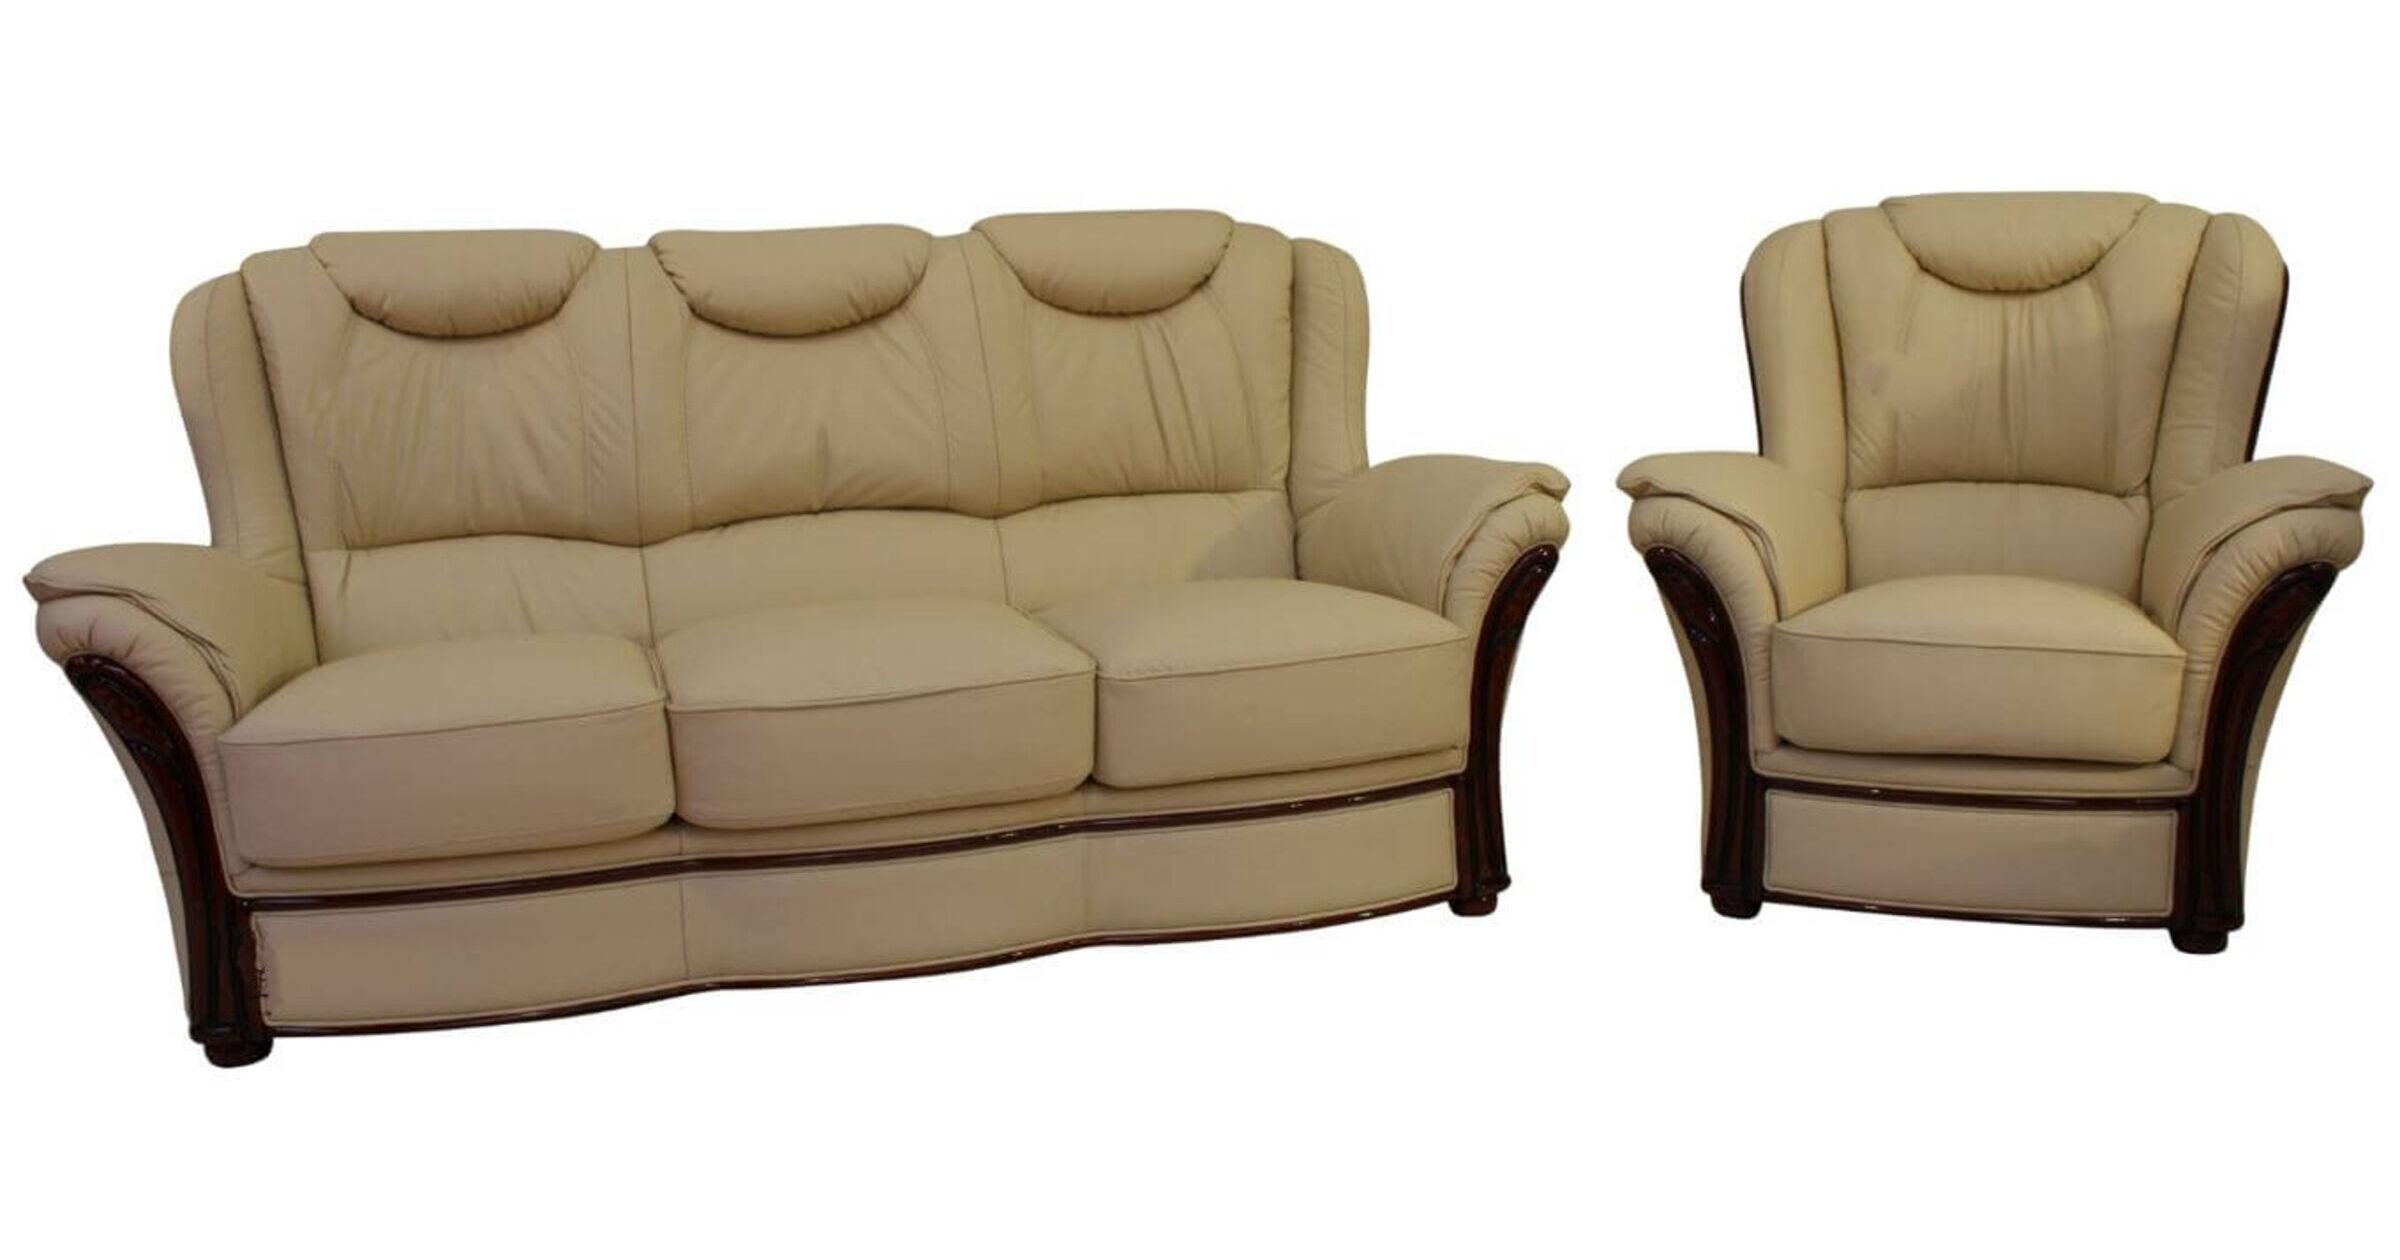 cream leather sofa set uk mickey mouse flip open with sleeping bag verona 3 431 genuine italian suite offer